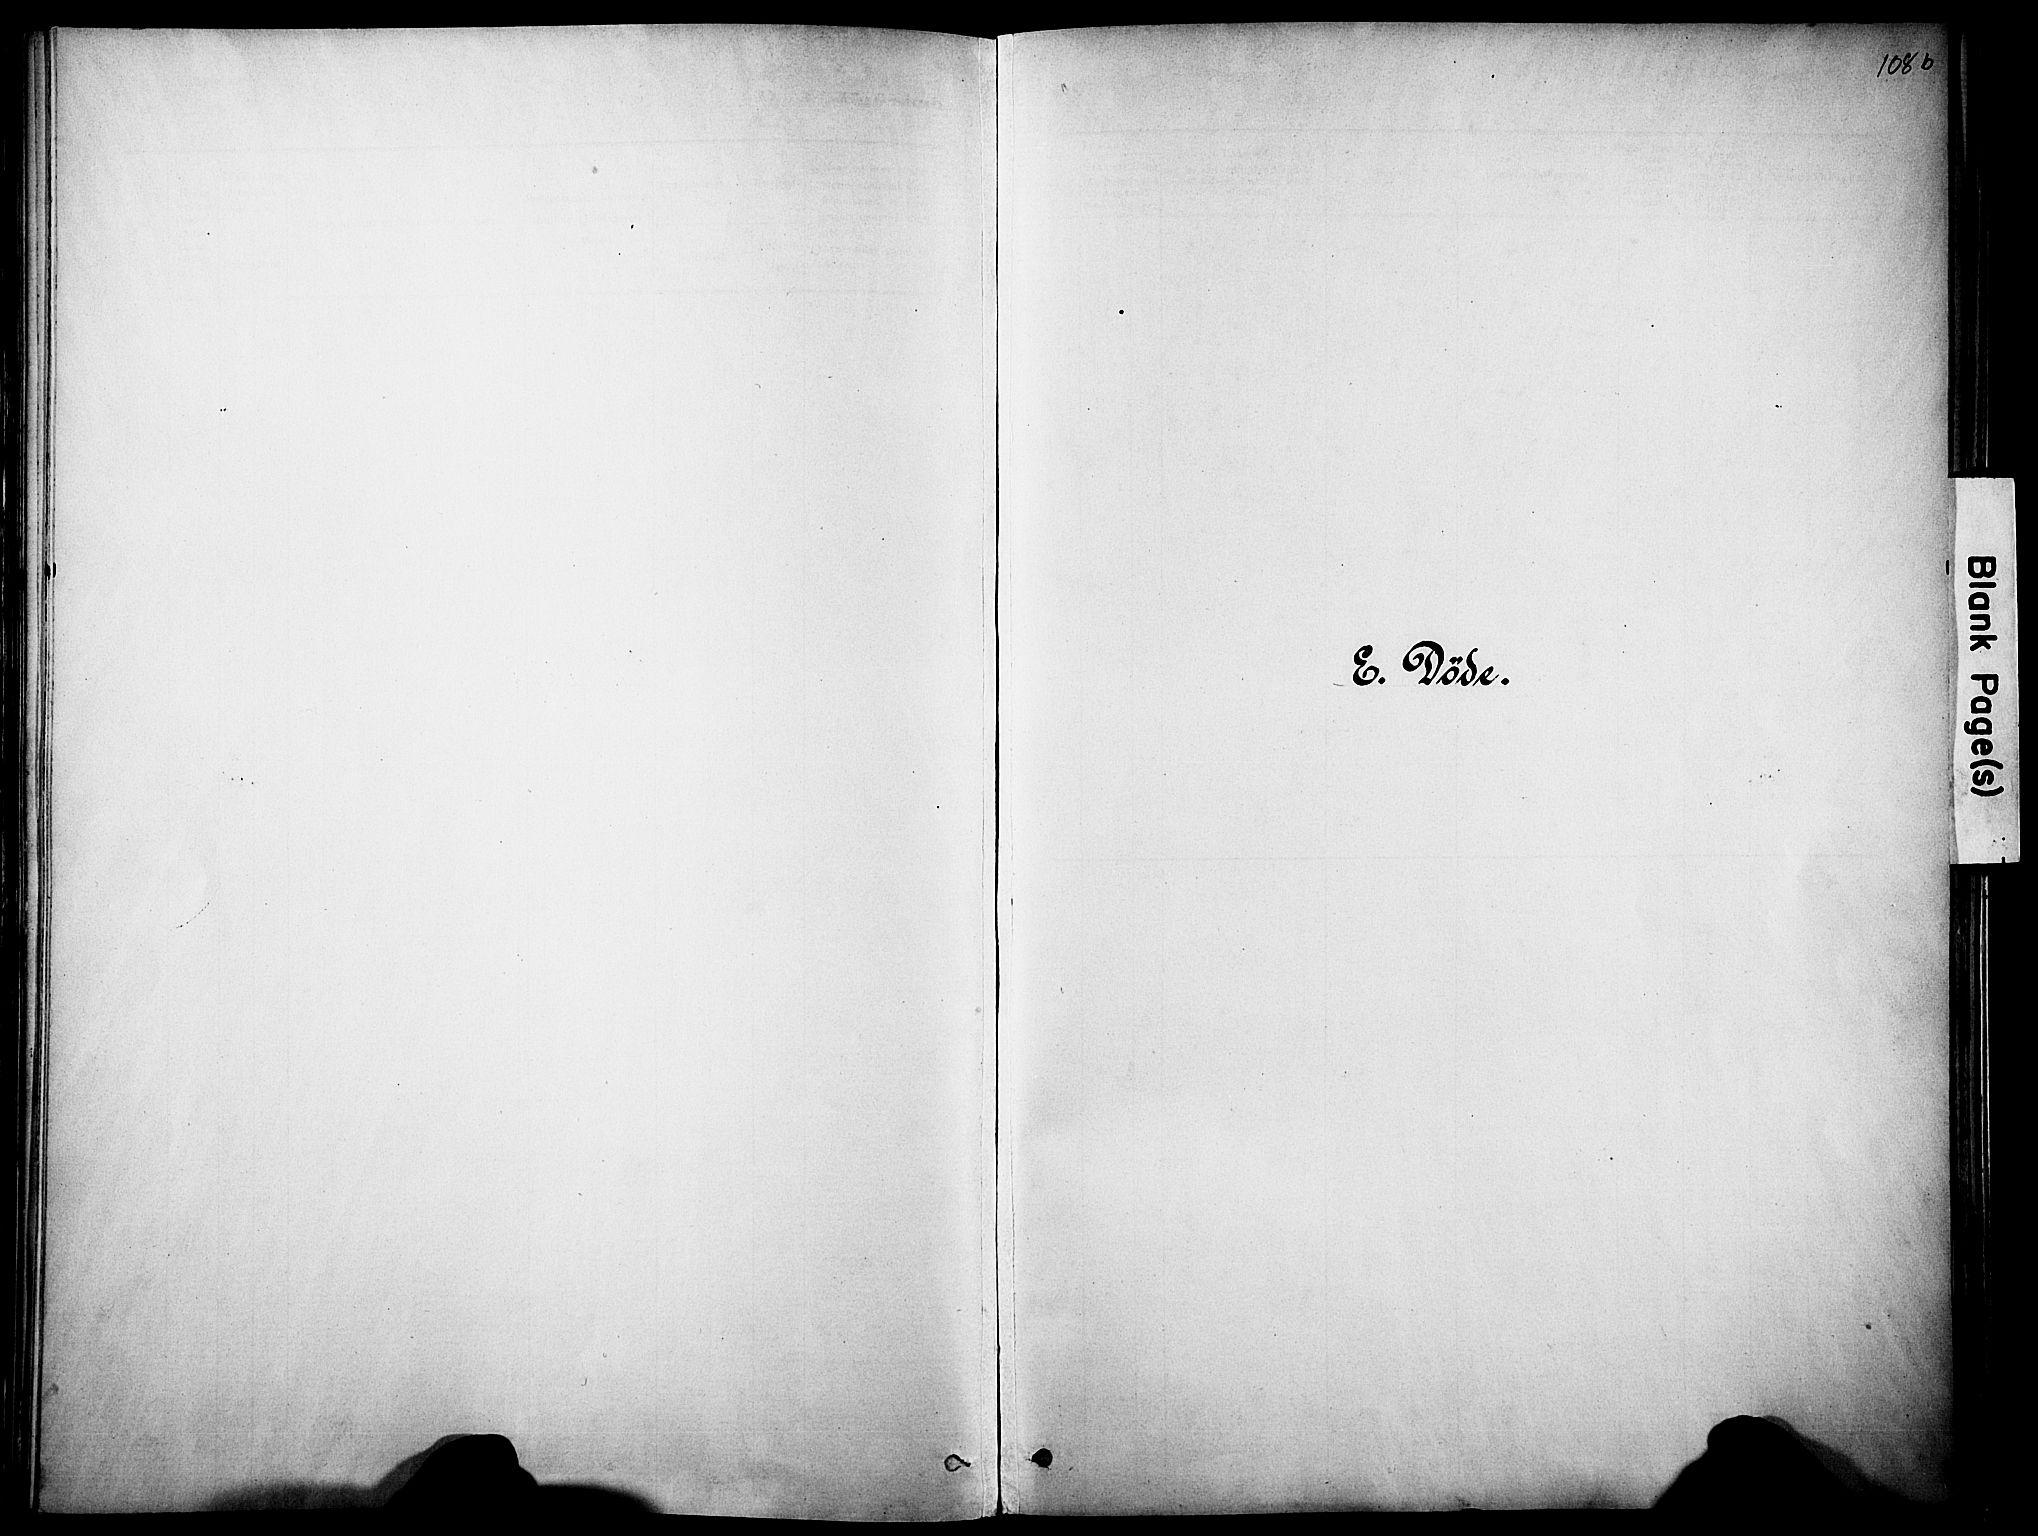 SAH, Vågå prestekontor, Ministerialbok nr. 10, 1887-1904, s. 108